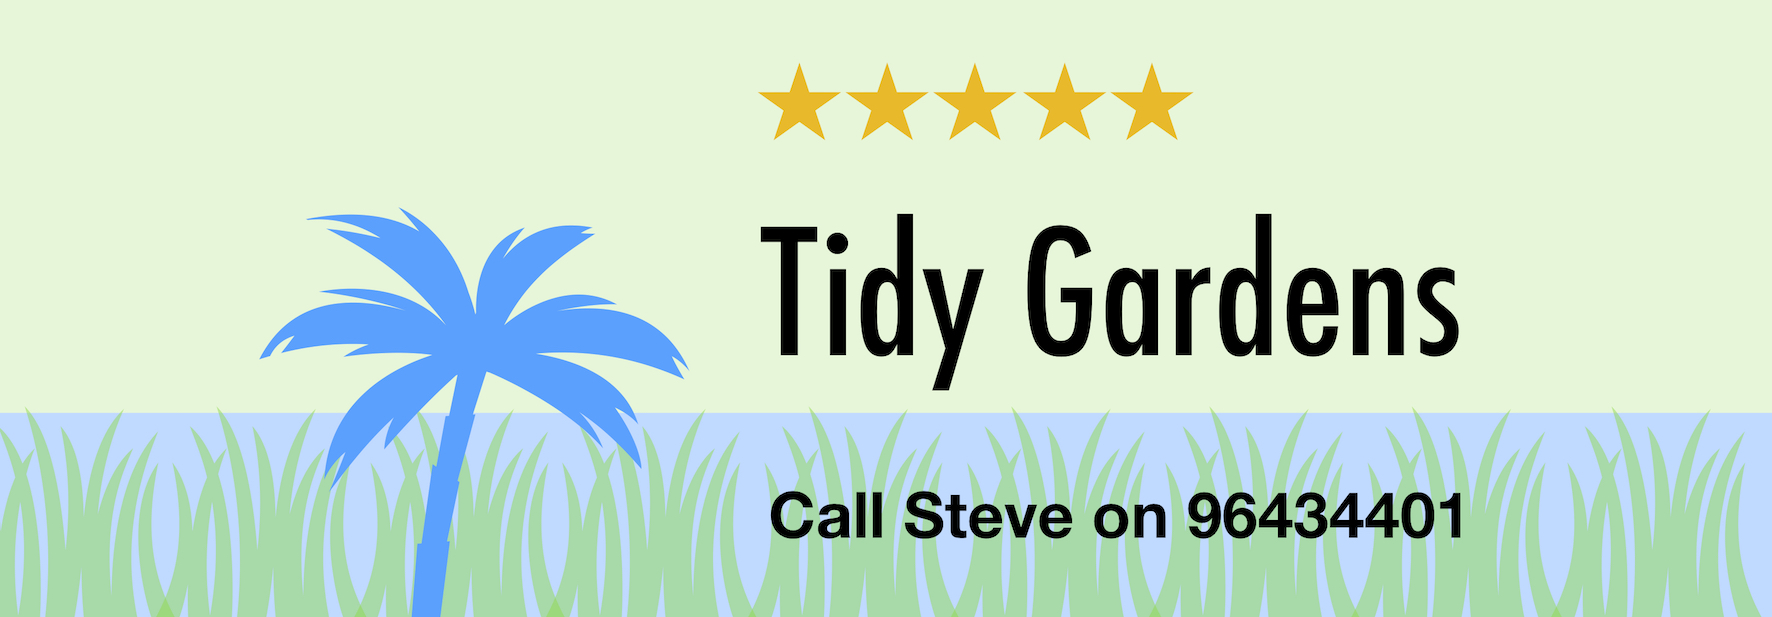 Tidy Gardens